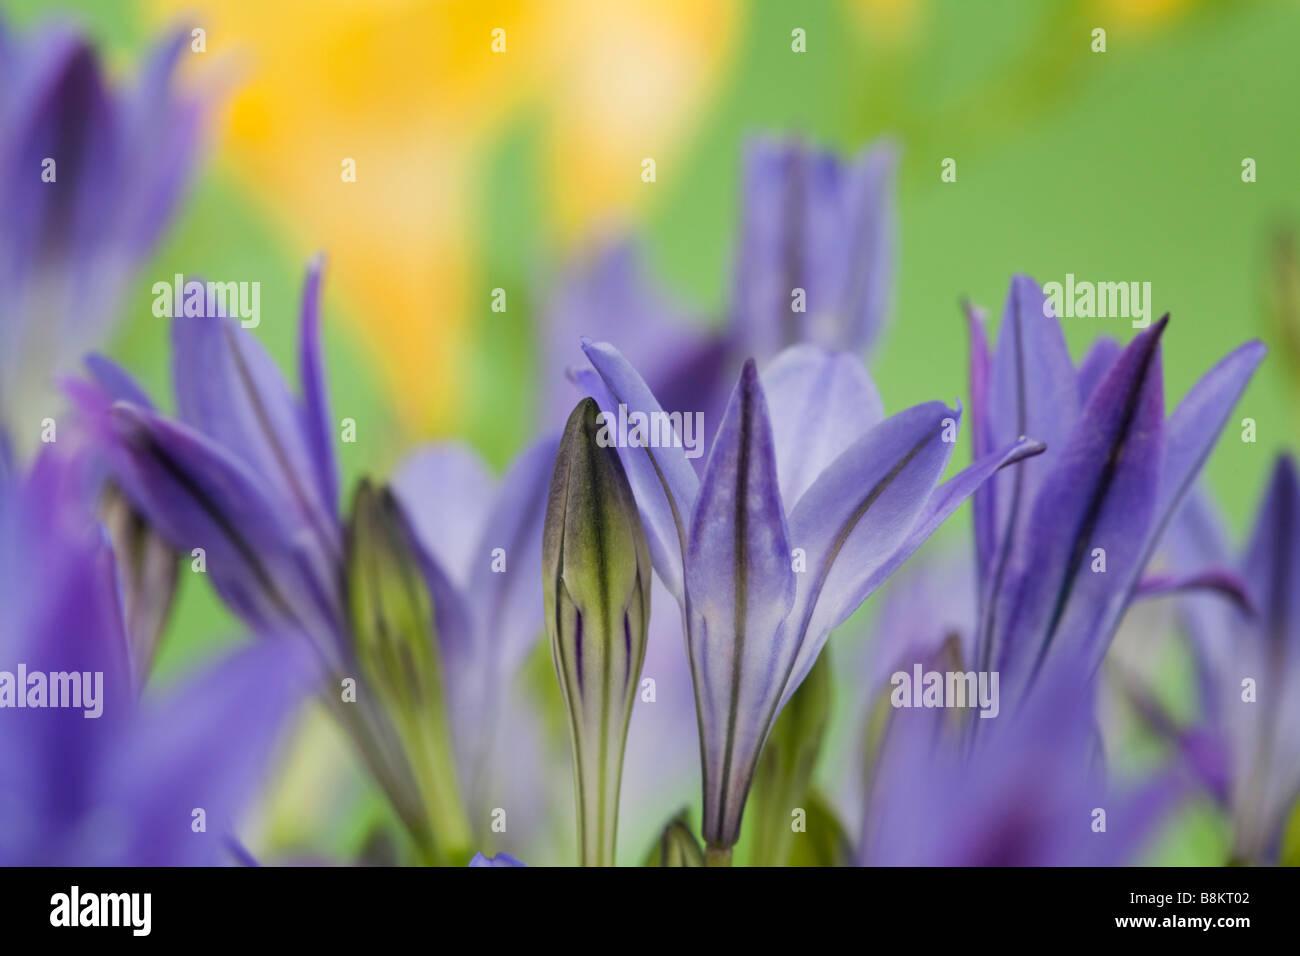 Triteleia Laxa oder Brodiaea Laxa aufrecht blass lila blaue Blüten in Nahaufnahme leise verbreitet. Stockbild